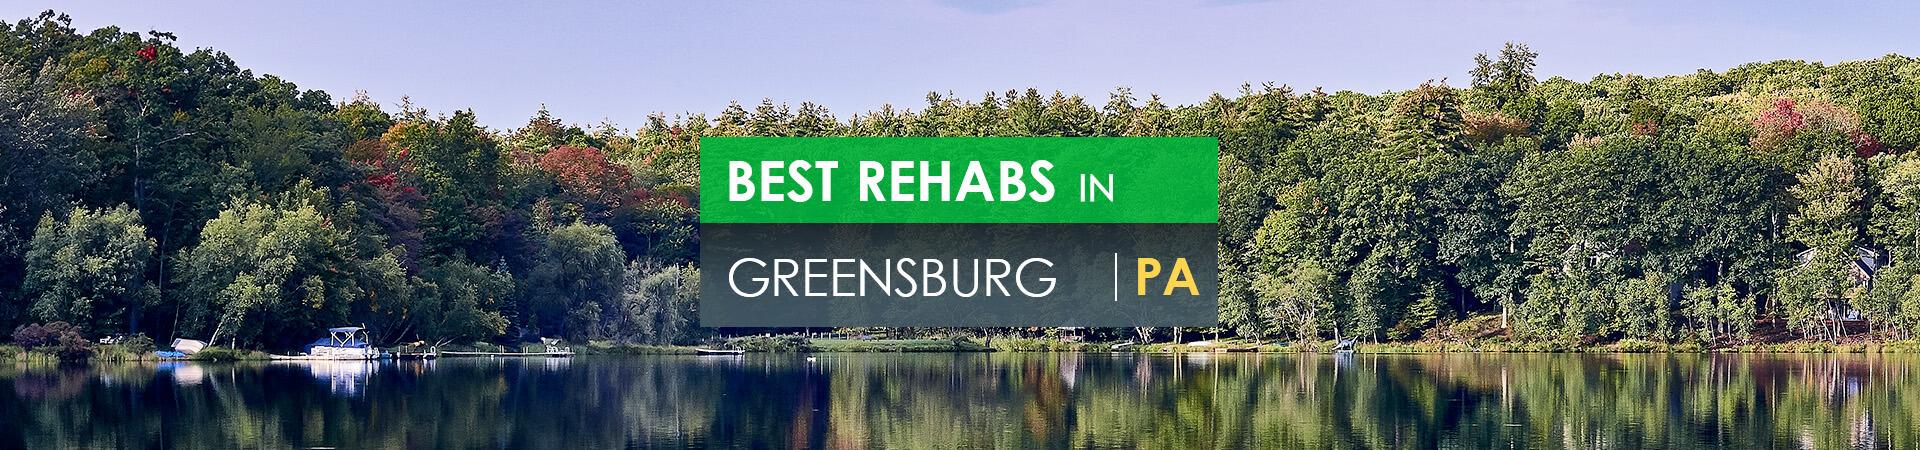 Best rehabs in Greensburg, PA